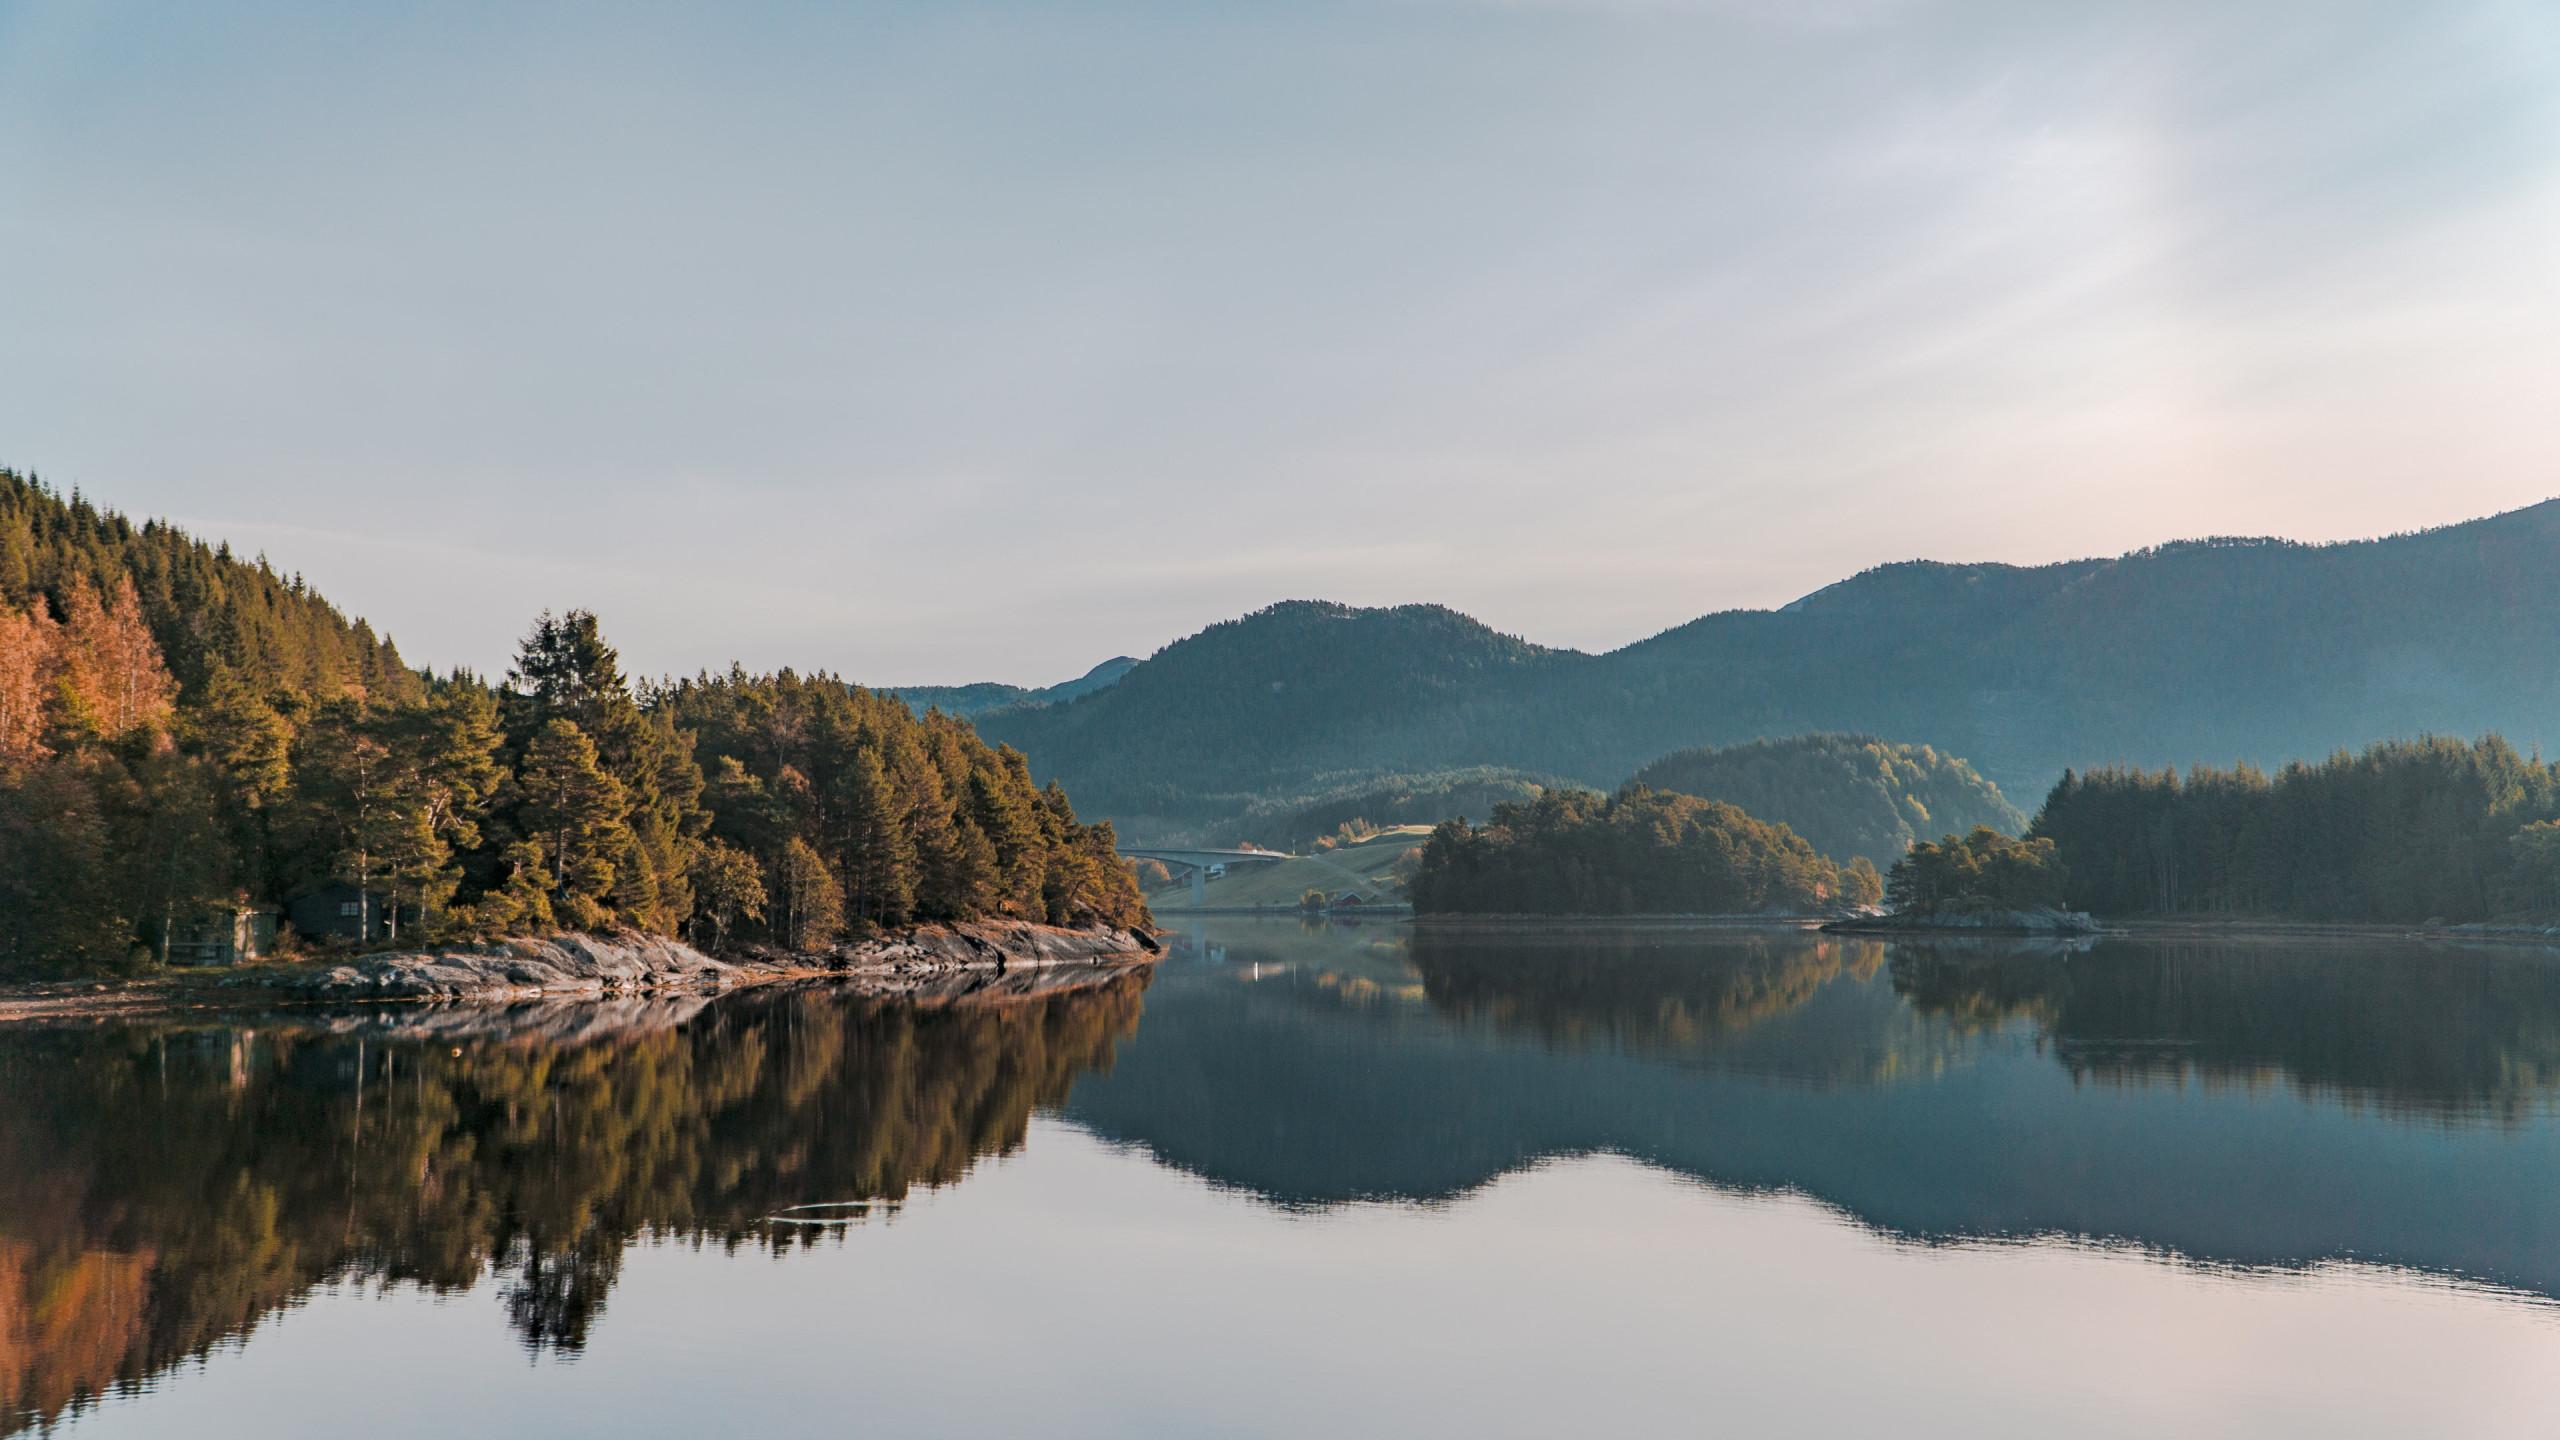 Download Wallpaper Nature In Norway 2560x1440